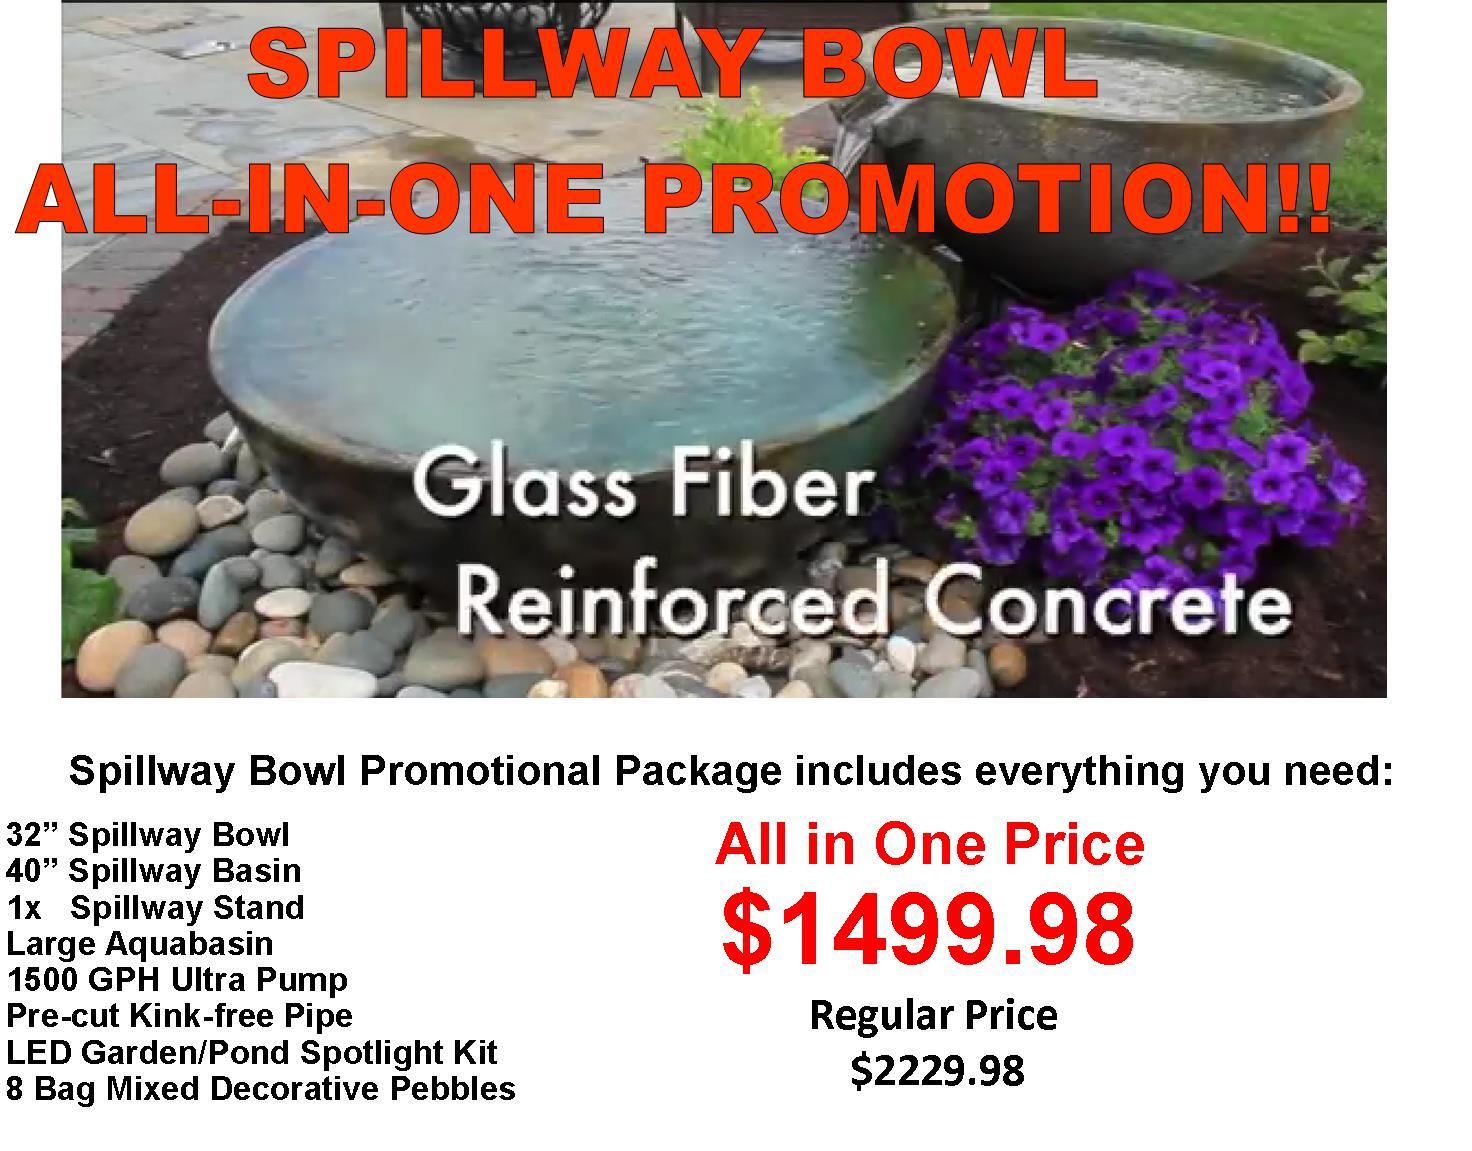 Spillway Bowl Promotion